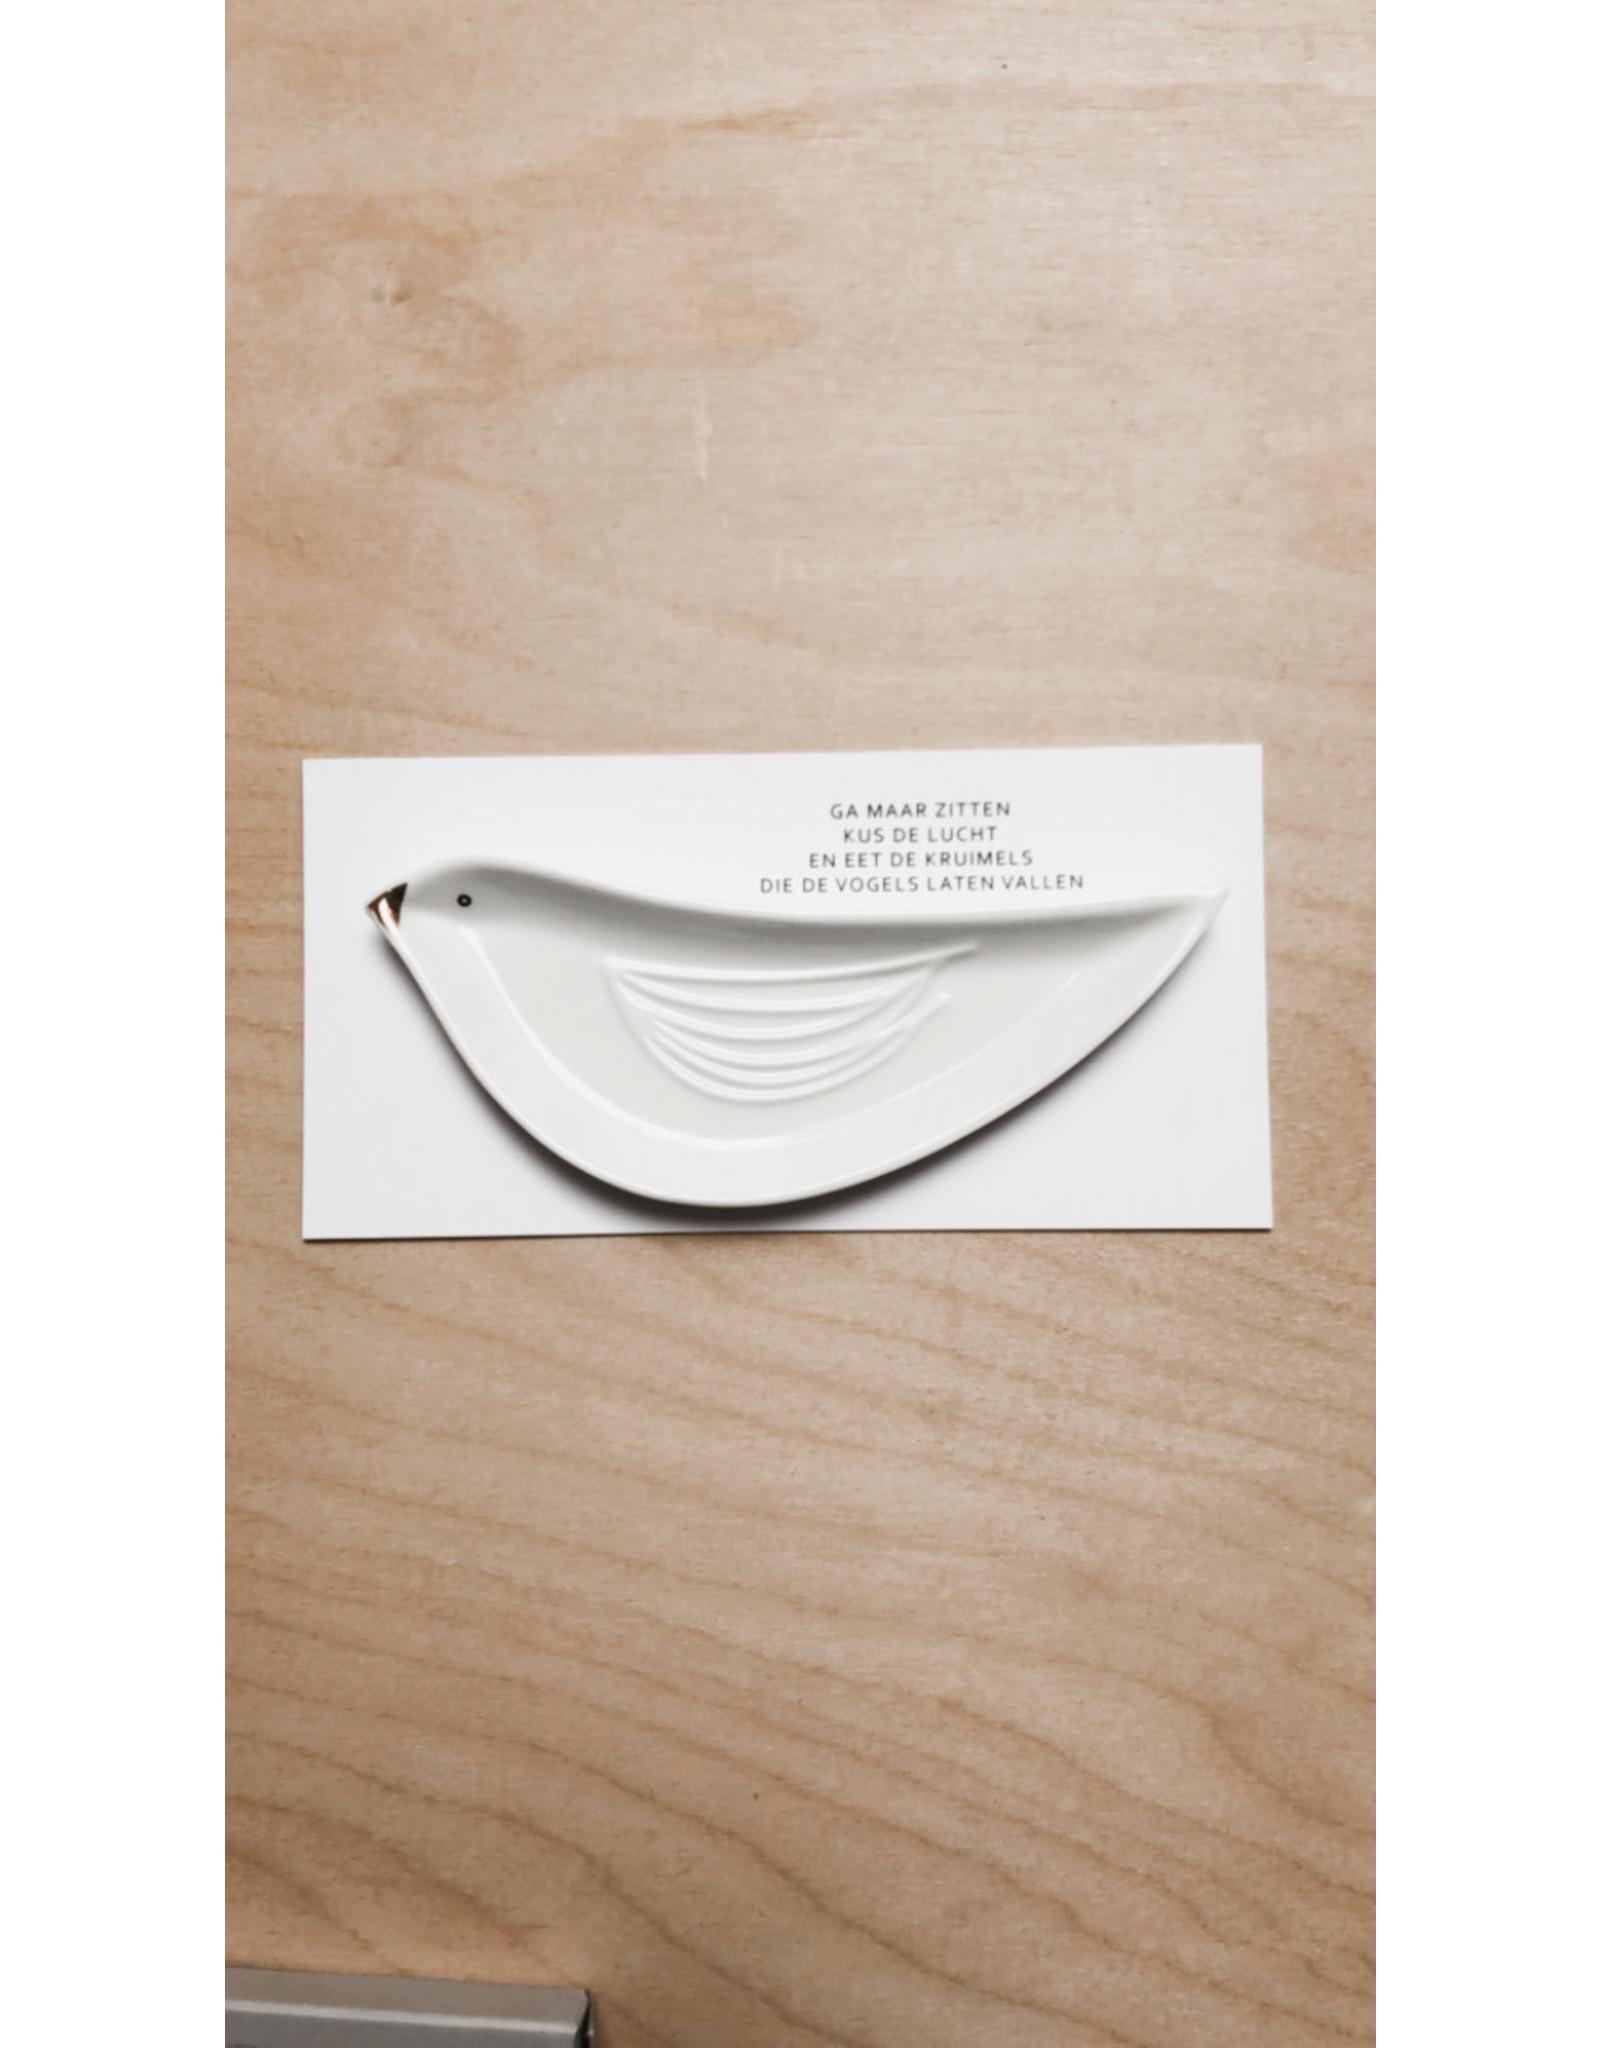 Raeder Geluksbordje + Gedichtje - Vogel + Kus de lucht - 13 x 4 cm